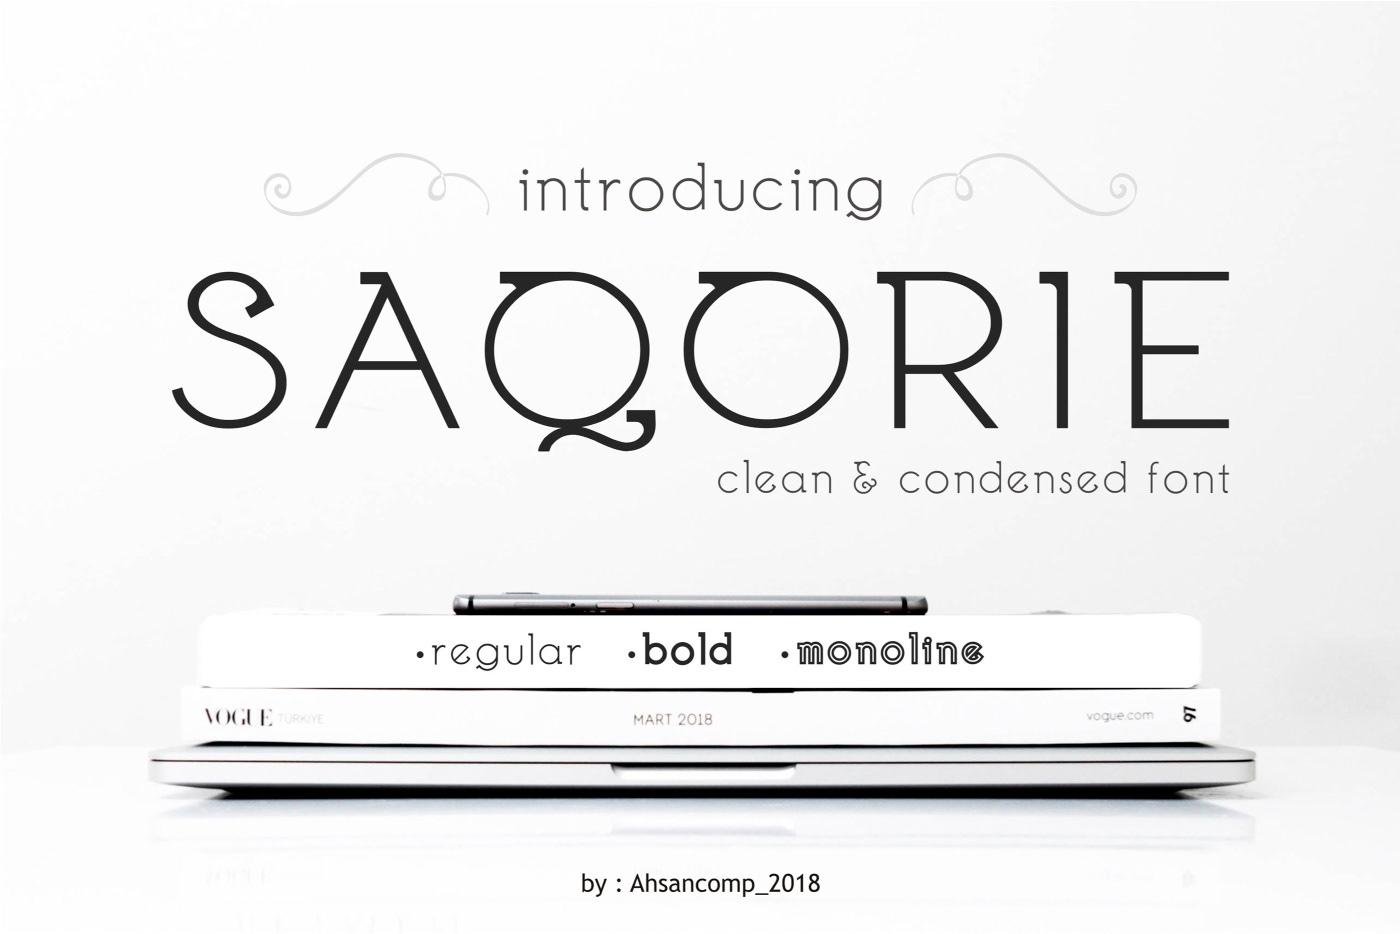 Saqorie创意logo设计现代艺术英文字体下载